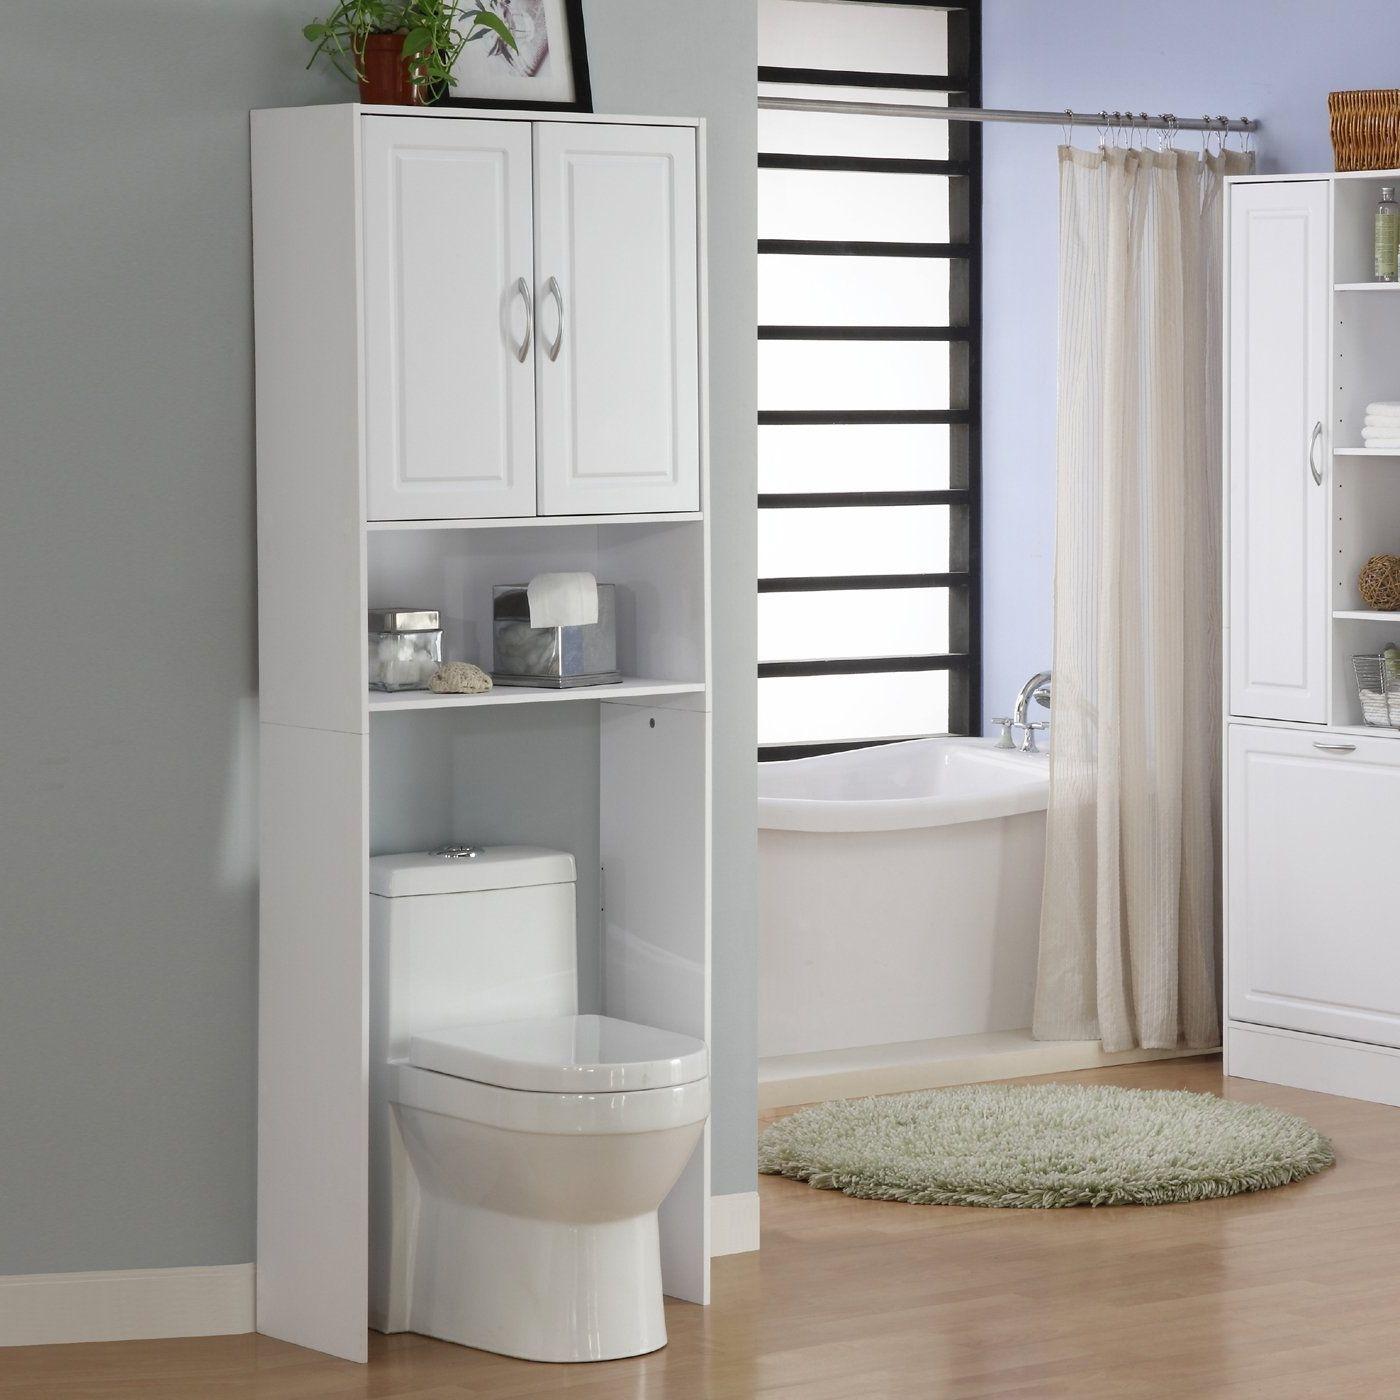 Merveilleux 10 Coolest Bathroom Storage Ideas For An Efficient Home